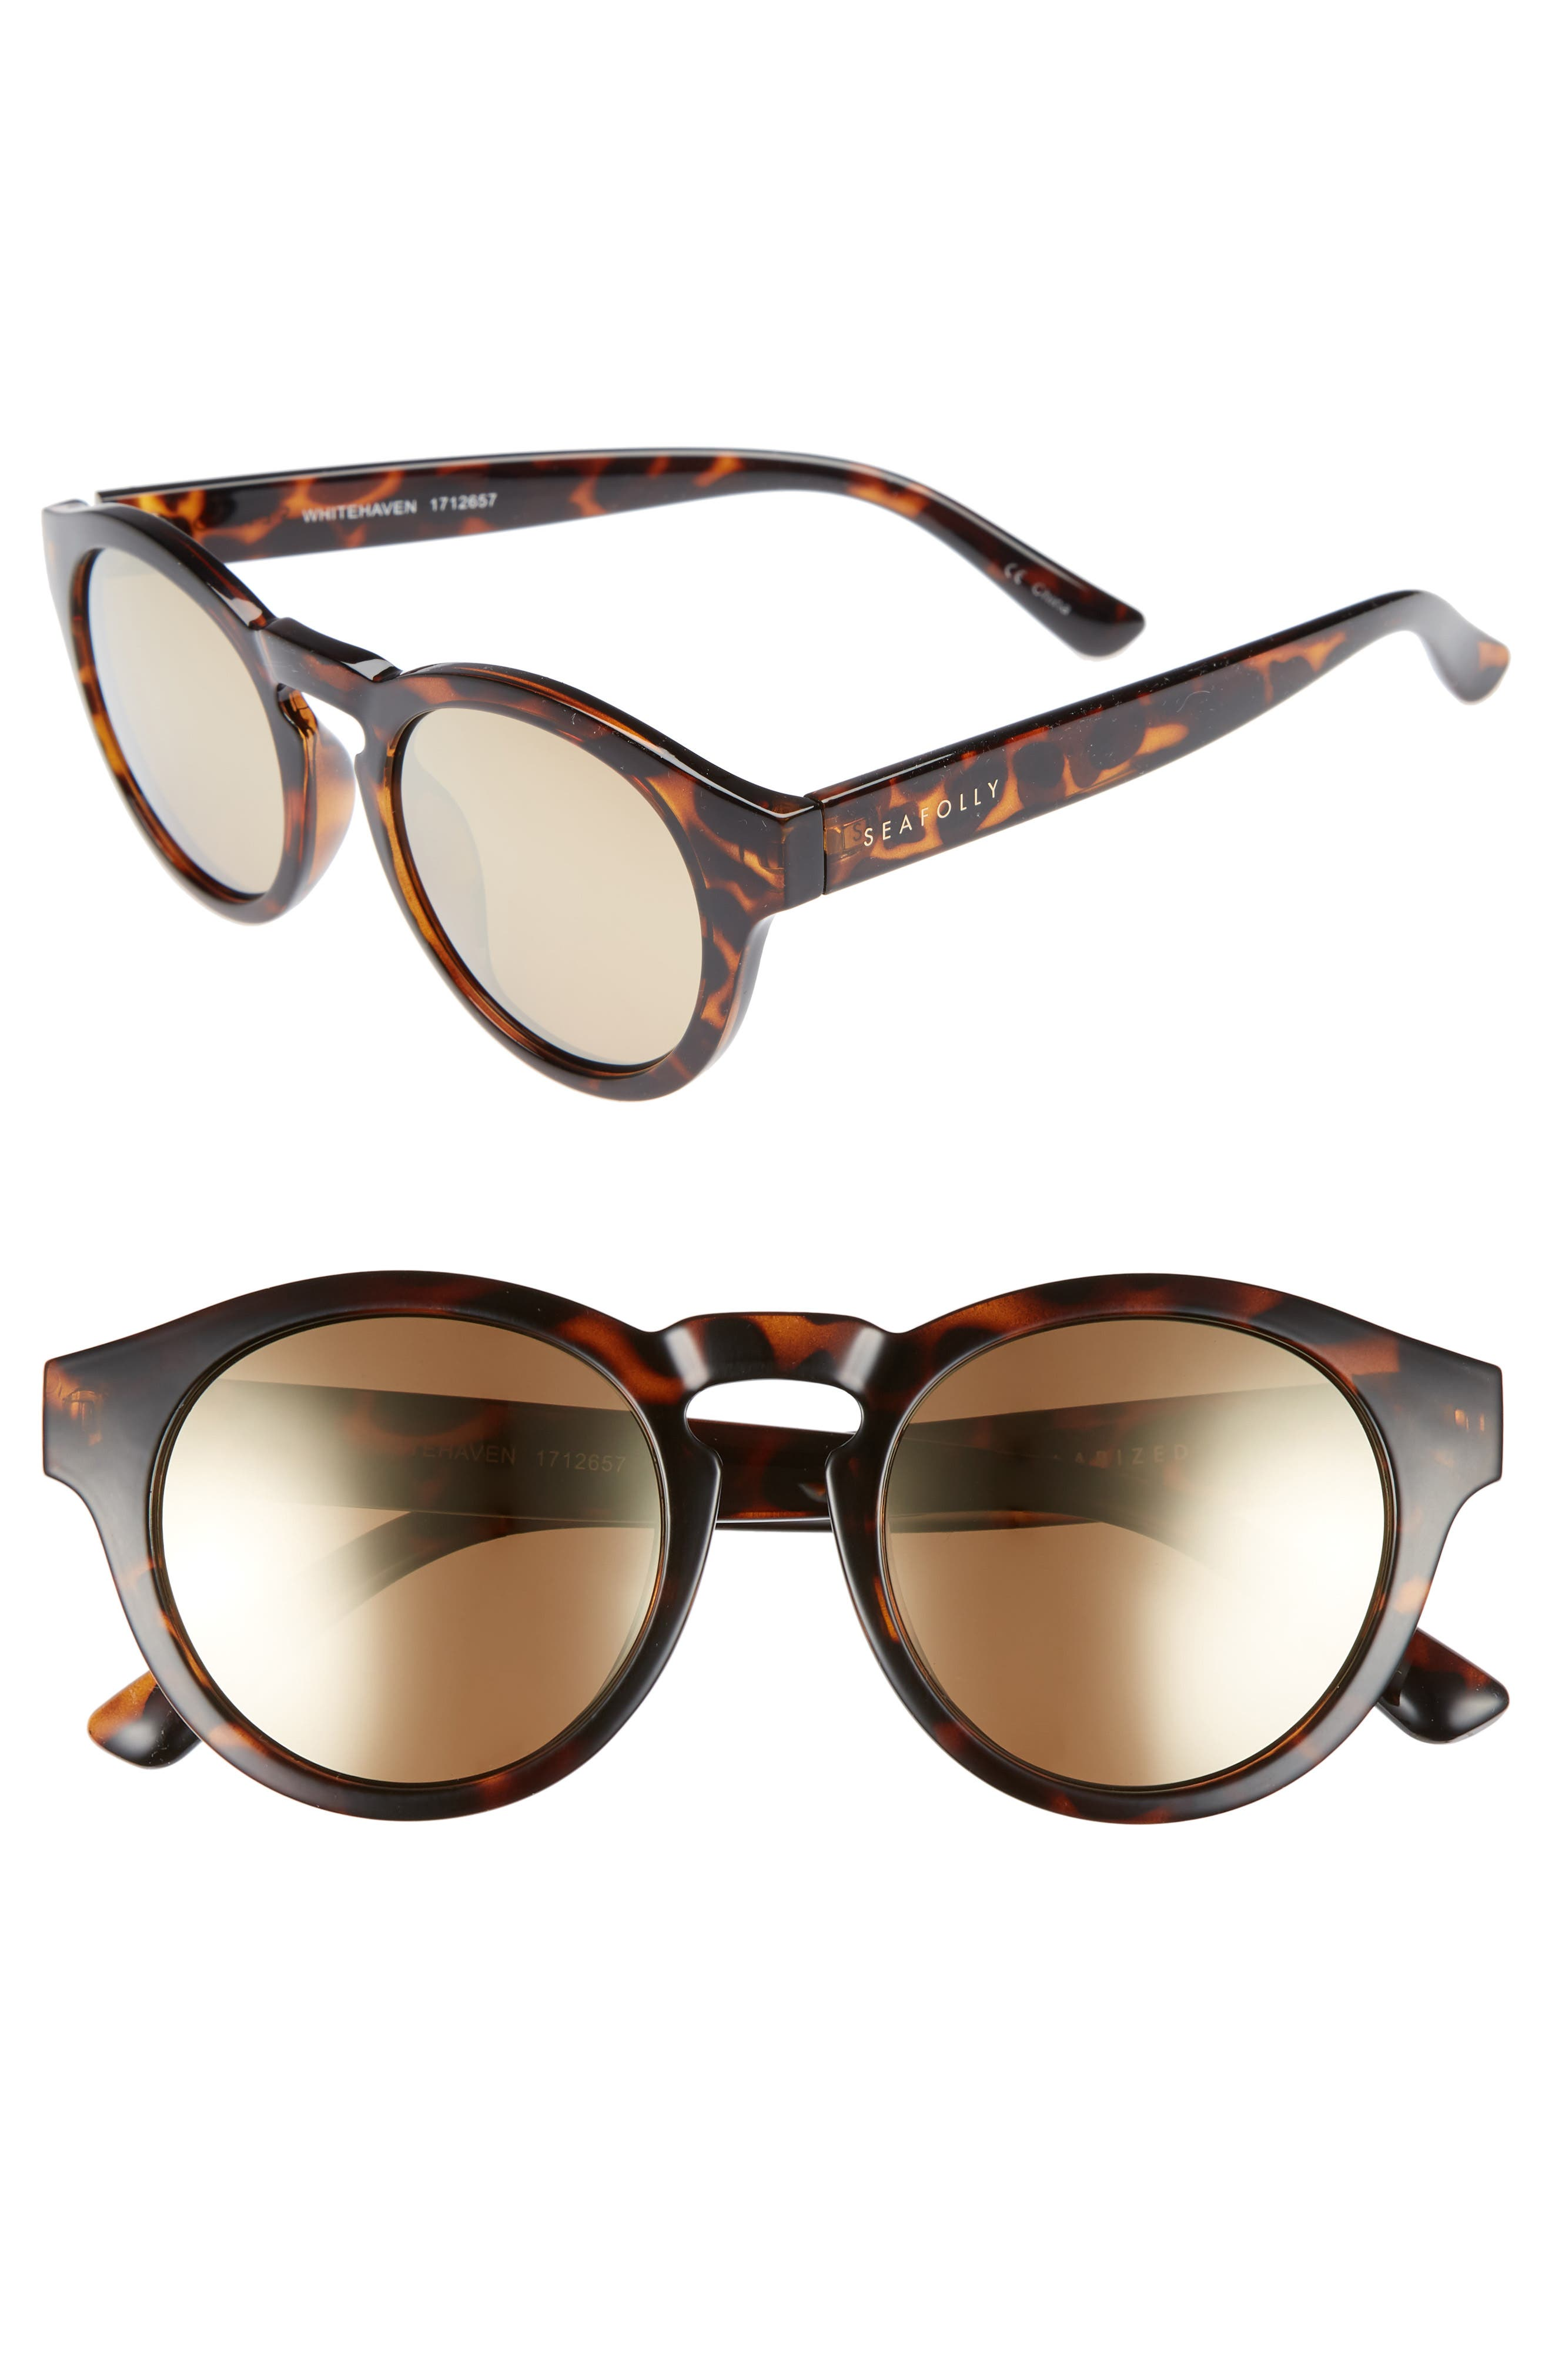 Whitehaven 49mm Round Lens Polarized Sunglasses,                             Main thumbnail 1, color,                             DARK TORT